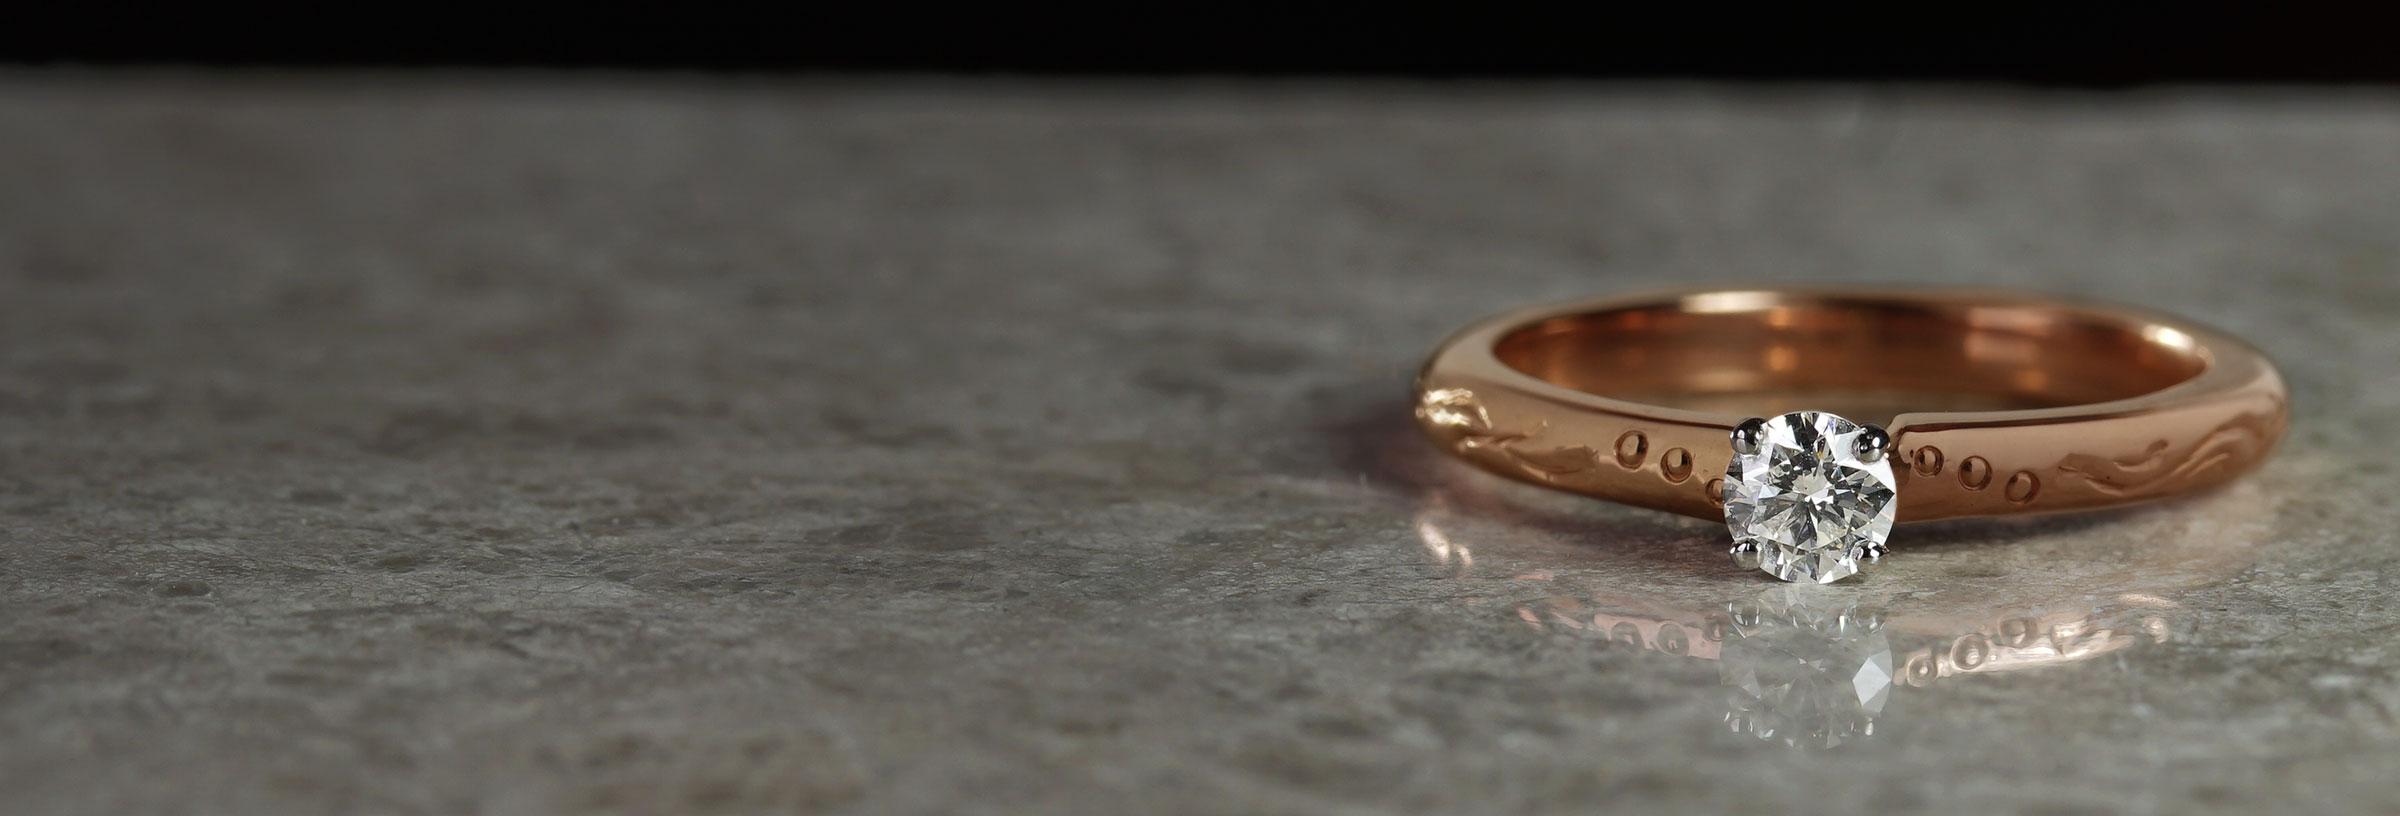 rose-gold-and-palladium-engraved-diamond-engagement-ring